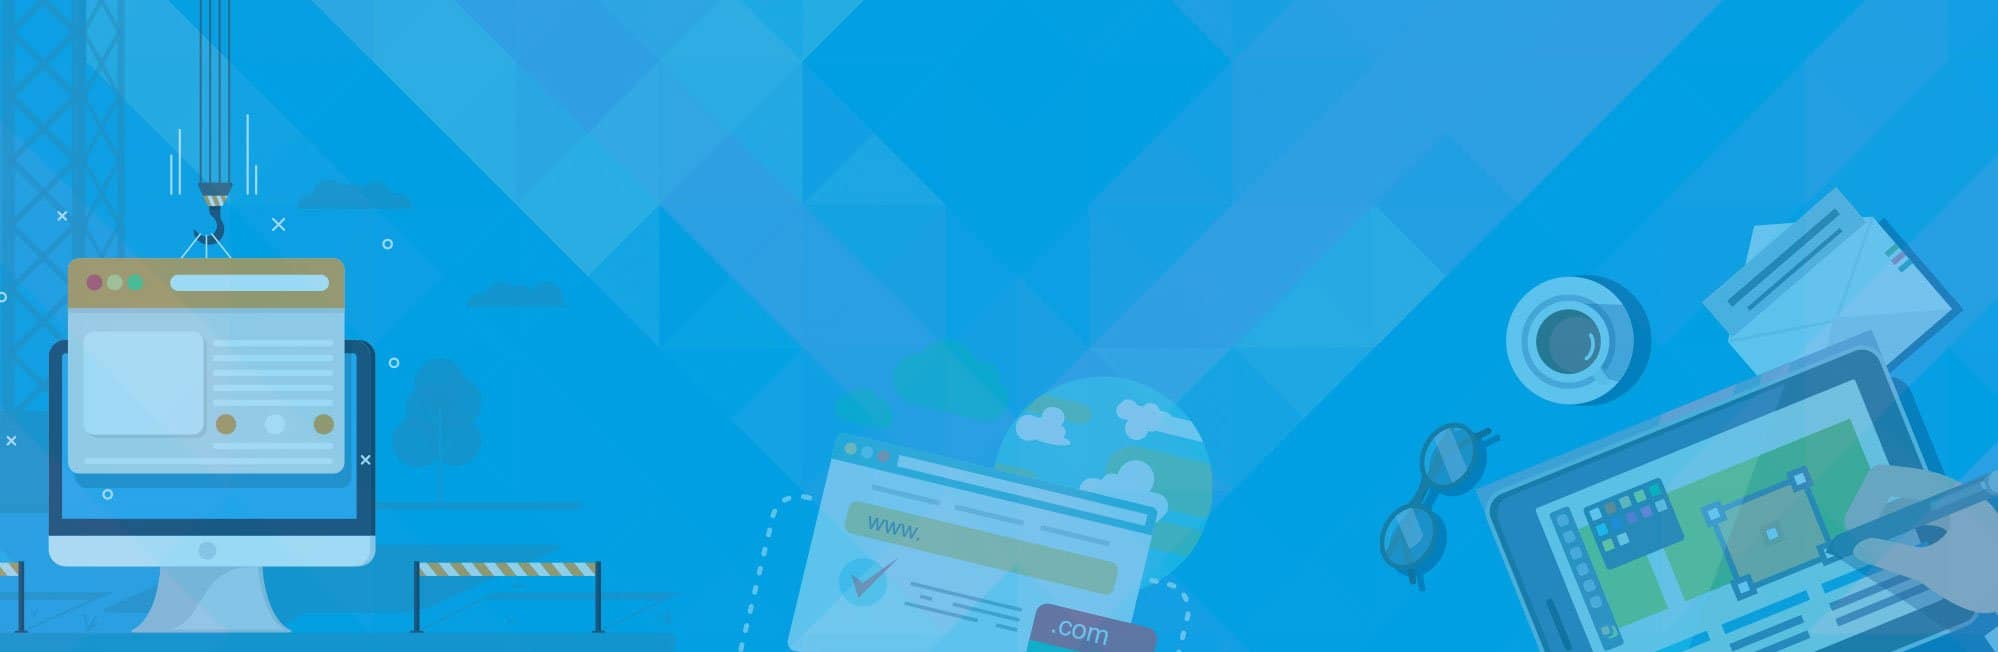 Slide Sviluppo Siti Web